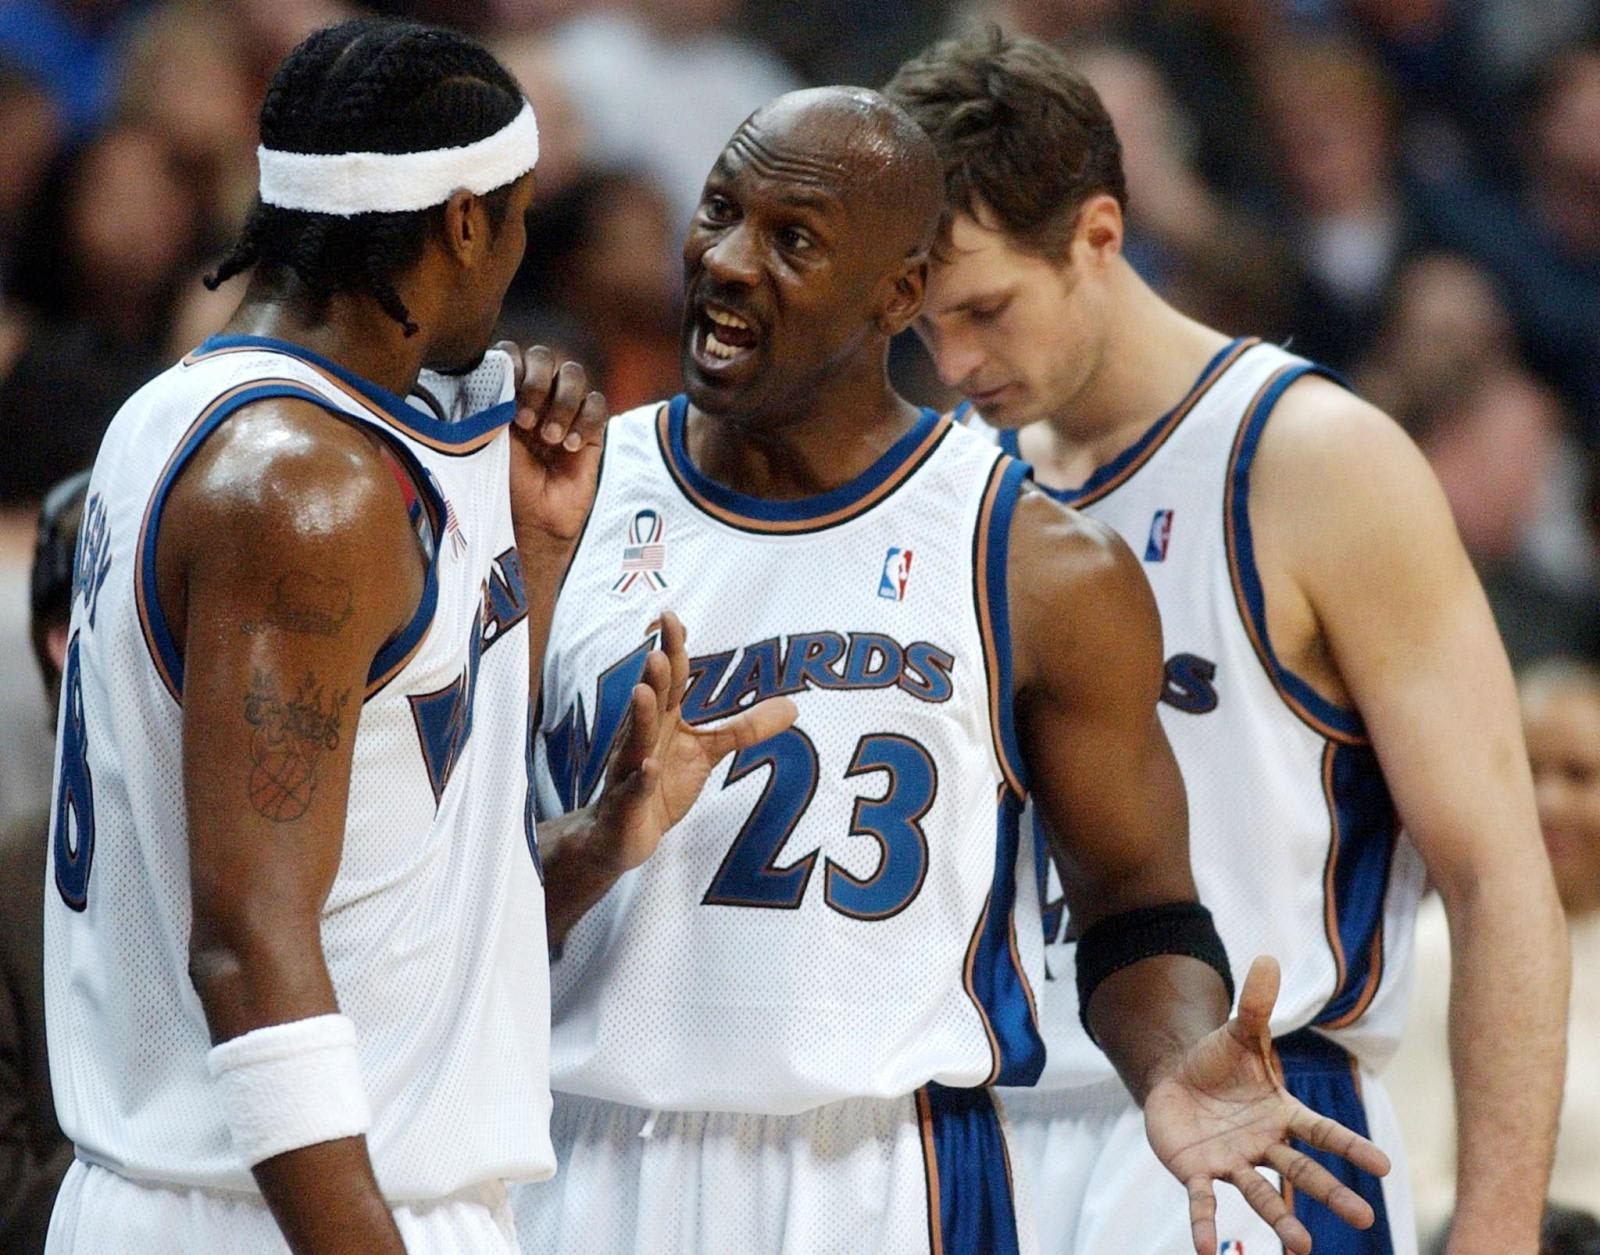 Oh querido finalizando hambruna  Chicago Bulls: 3 players you forgot were Michael Jordan teammates